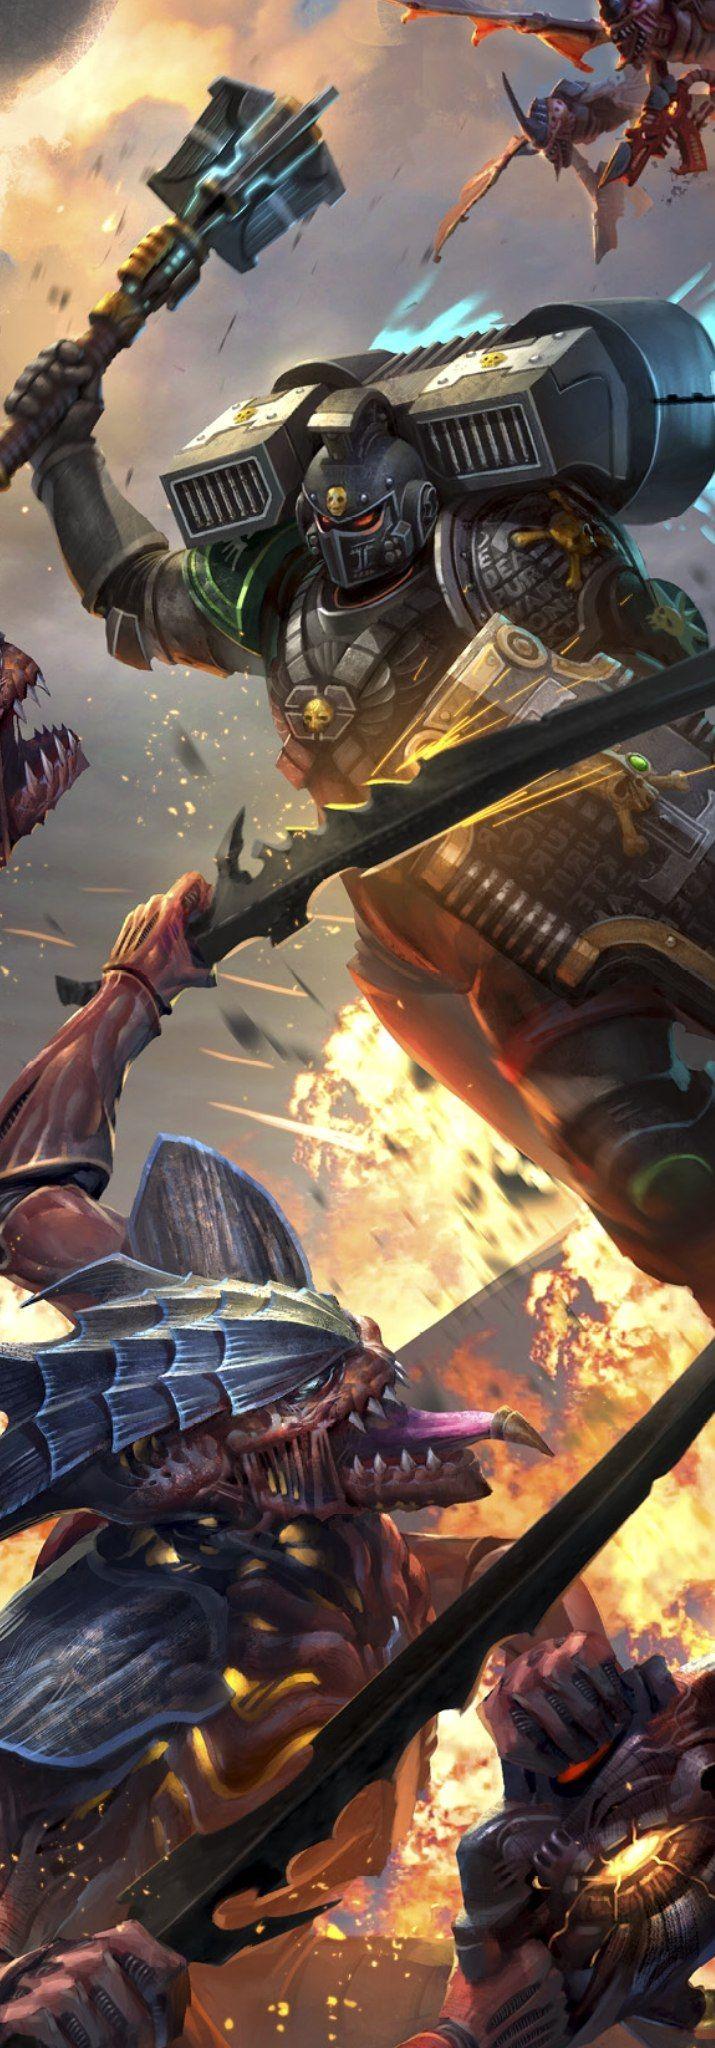 Warhammer 40000,warhammer40000, warhammer40k, warhammer 40k, ваха, сорокотысячник,фэндомы,Deathwatch,Ordo Xenos,Inquisition,Imperium,Империум,Eldar,Элдар,Tyranids,Тираниды,Orks,Tau Empire,Tau, Тау,Space Marine,Adeptus Astartes,Dark Eldar,Guardians,Warlocks,Wraithguard